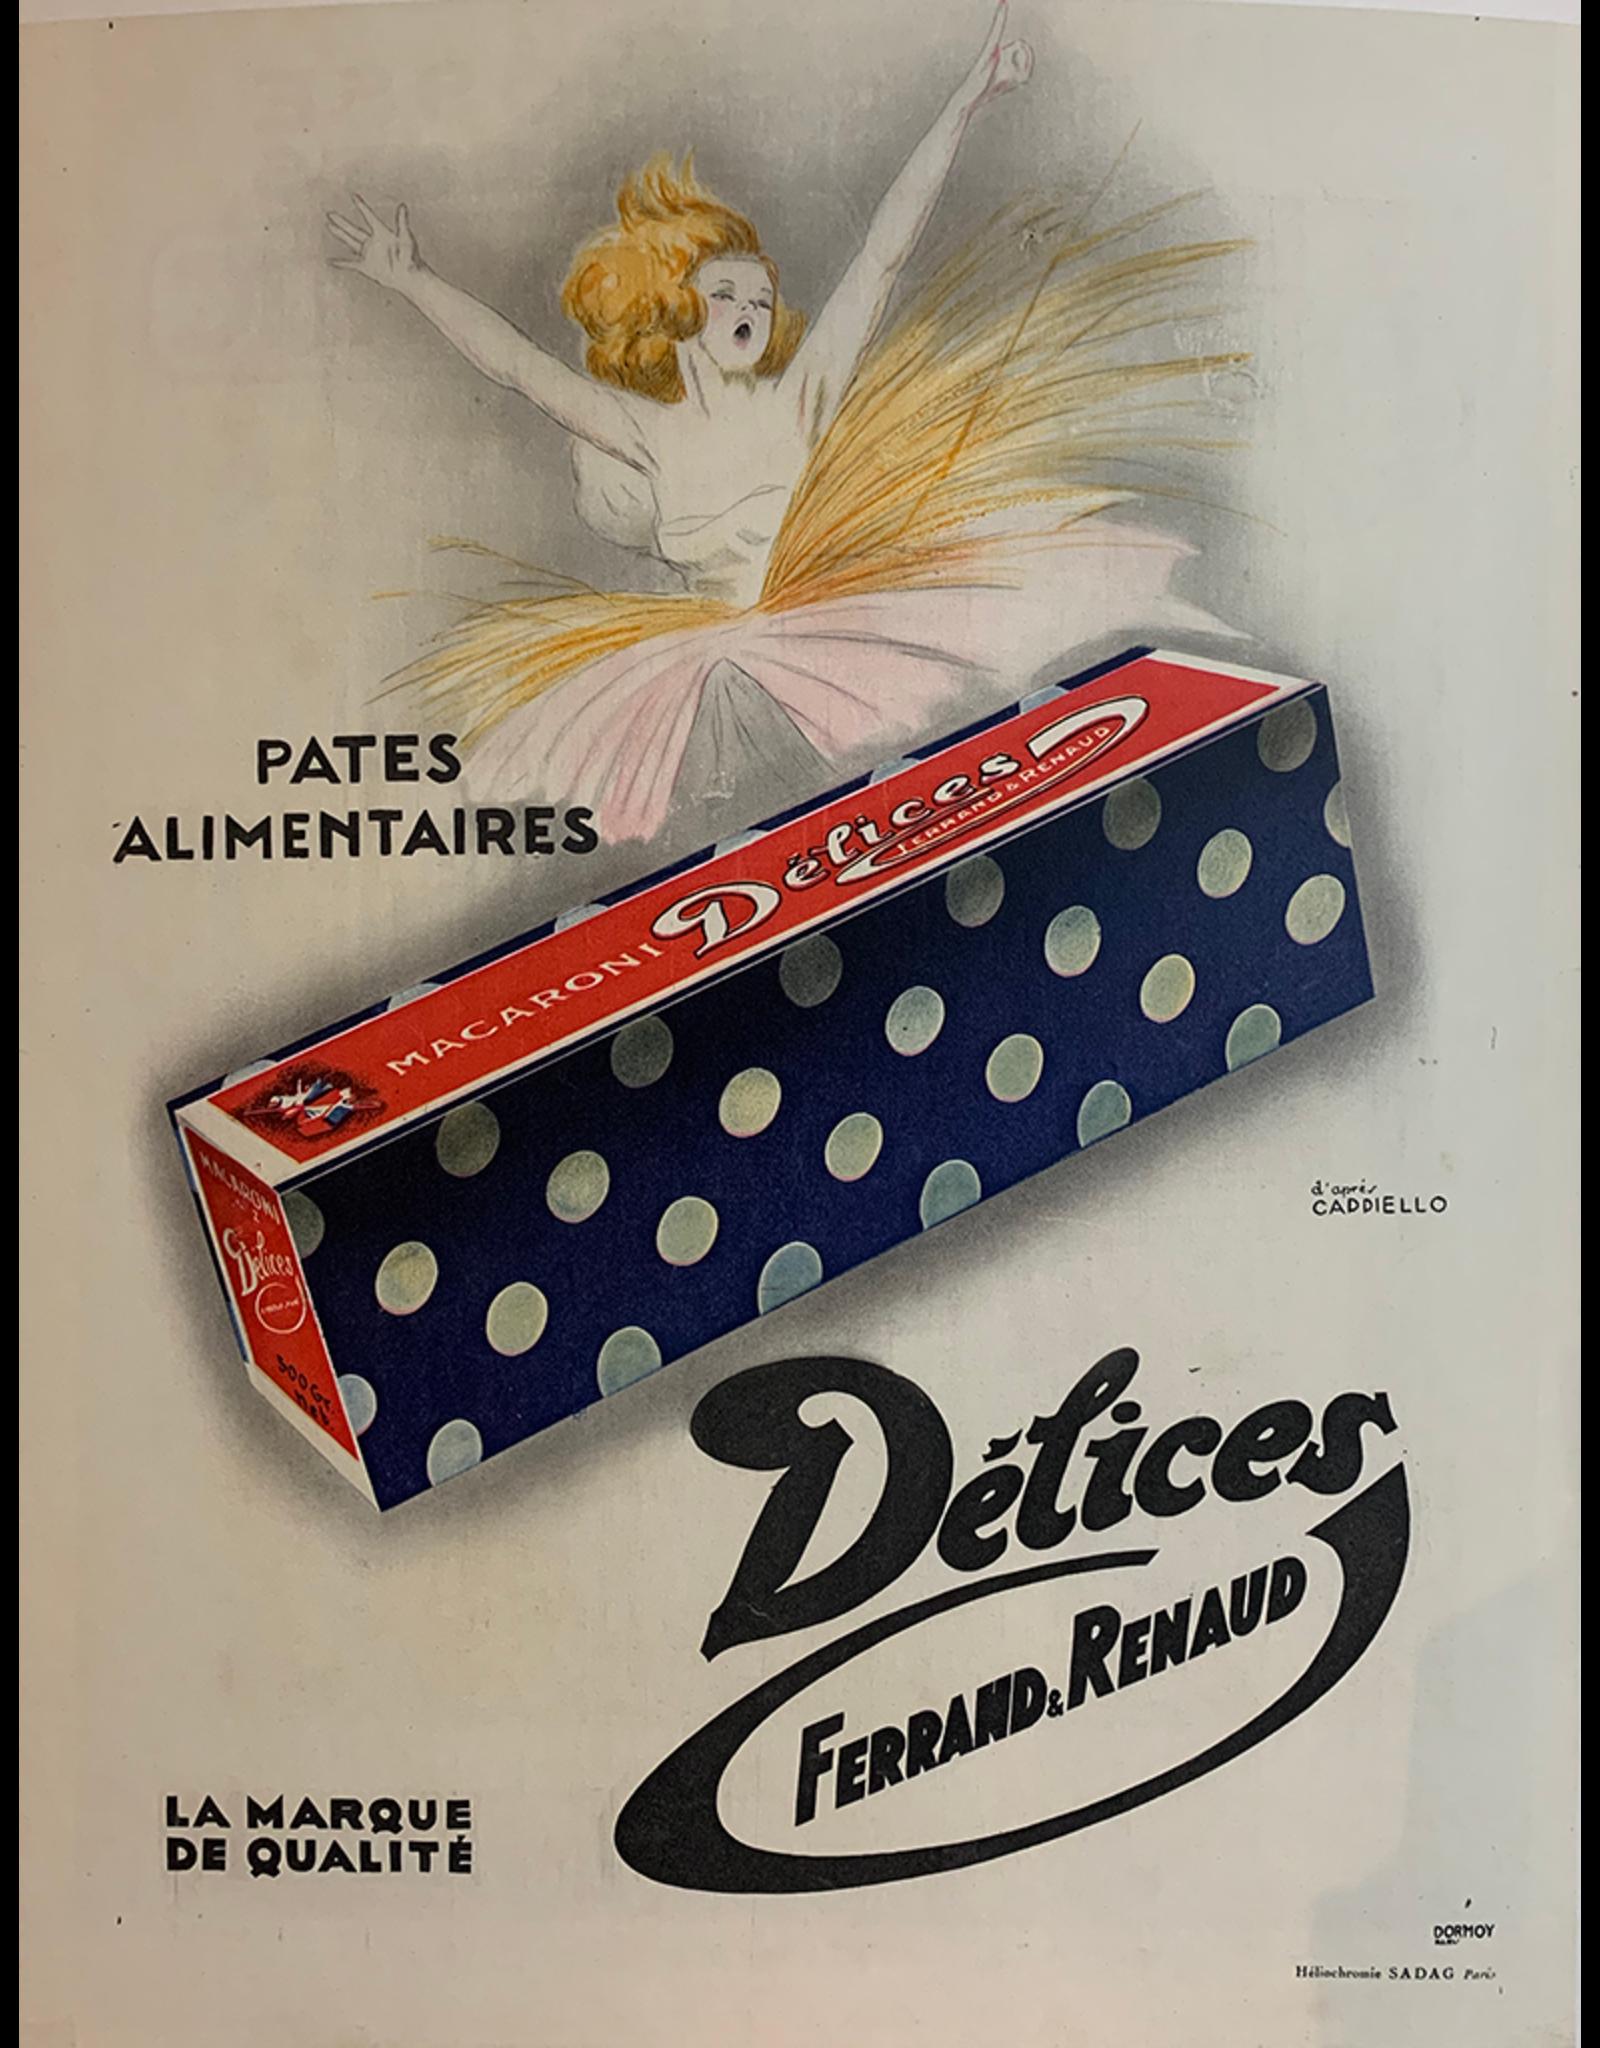 SPV Delices Ferrand & Renaud